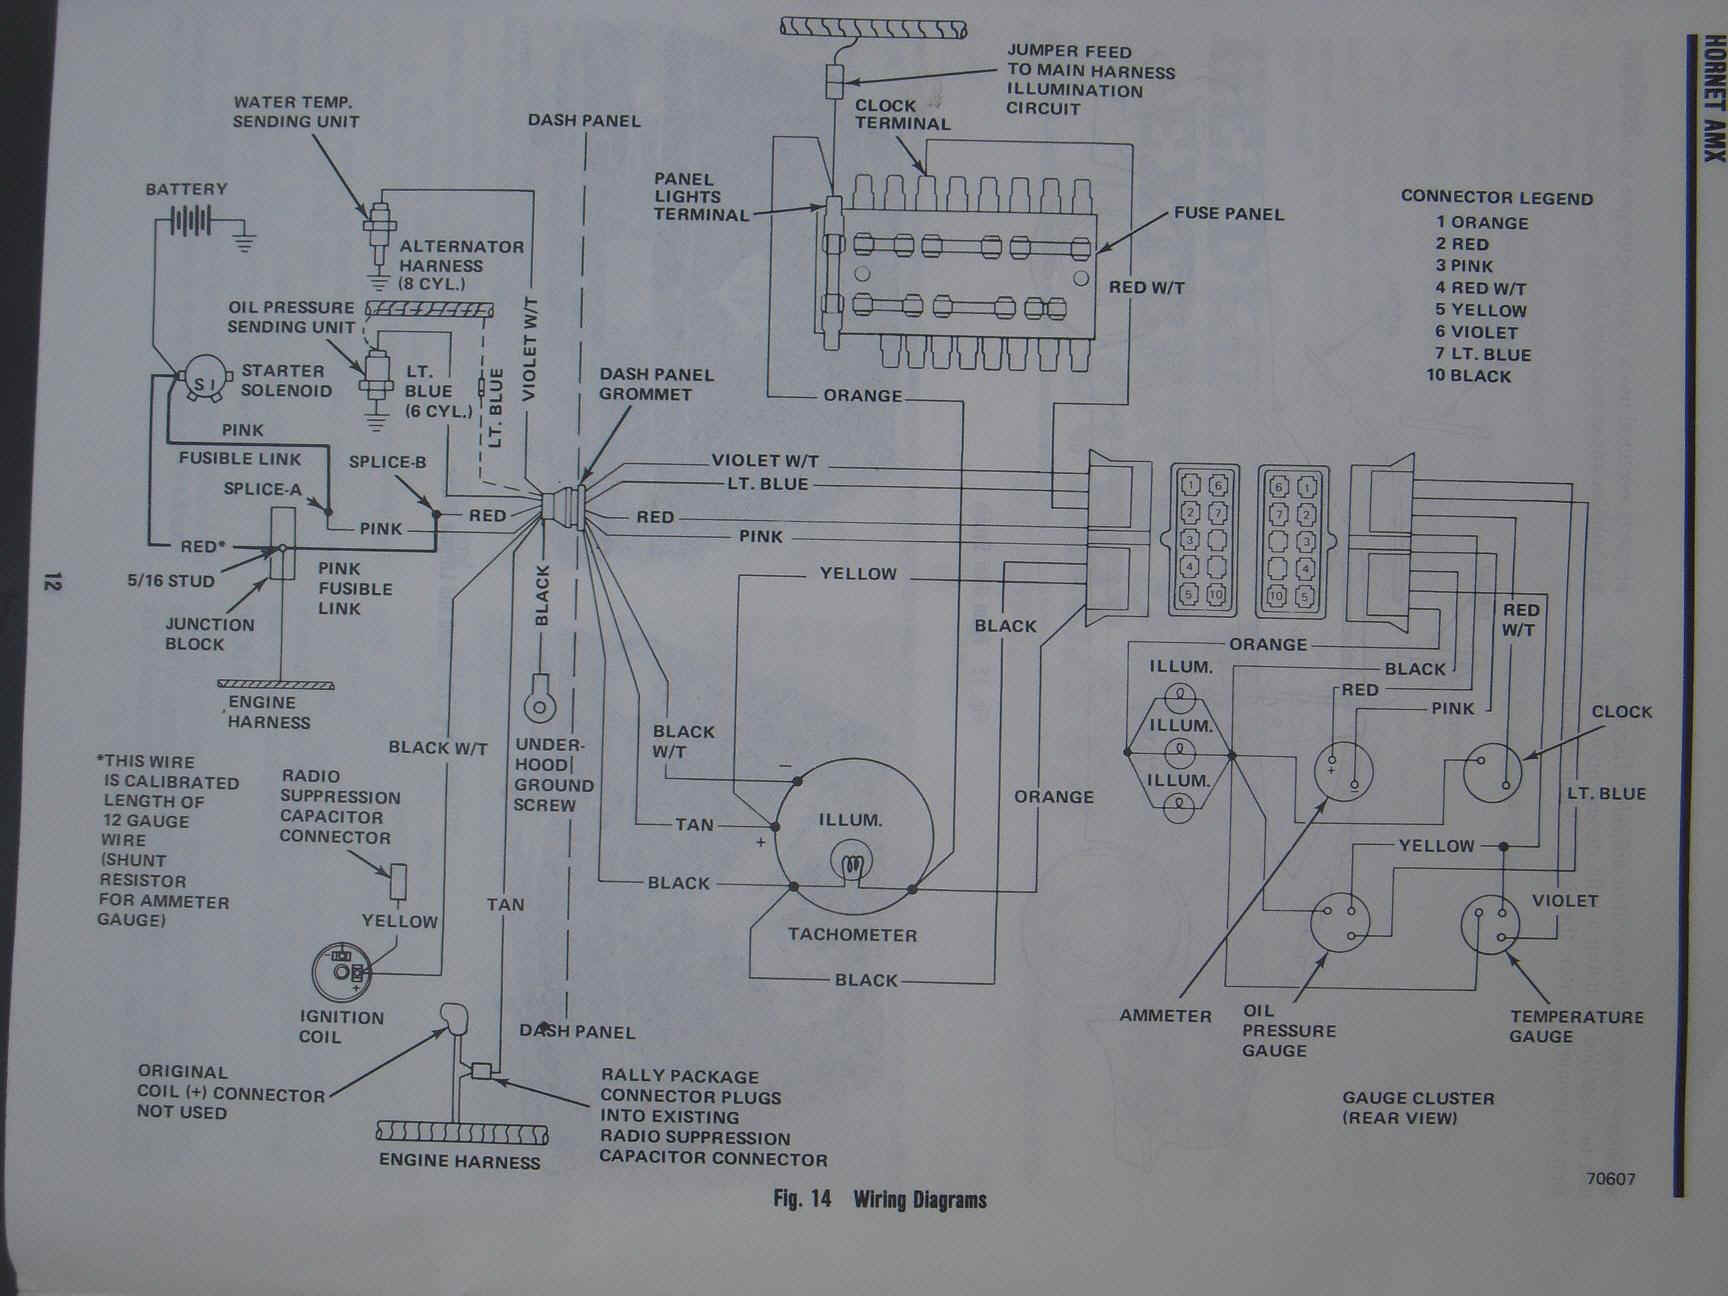 1974 Amc Wiring Diagram -1994 C1500 Wiring Diagram | Begeboy Wiring Diagram  SourceBegeboy Wiring Diagram Source